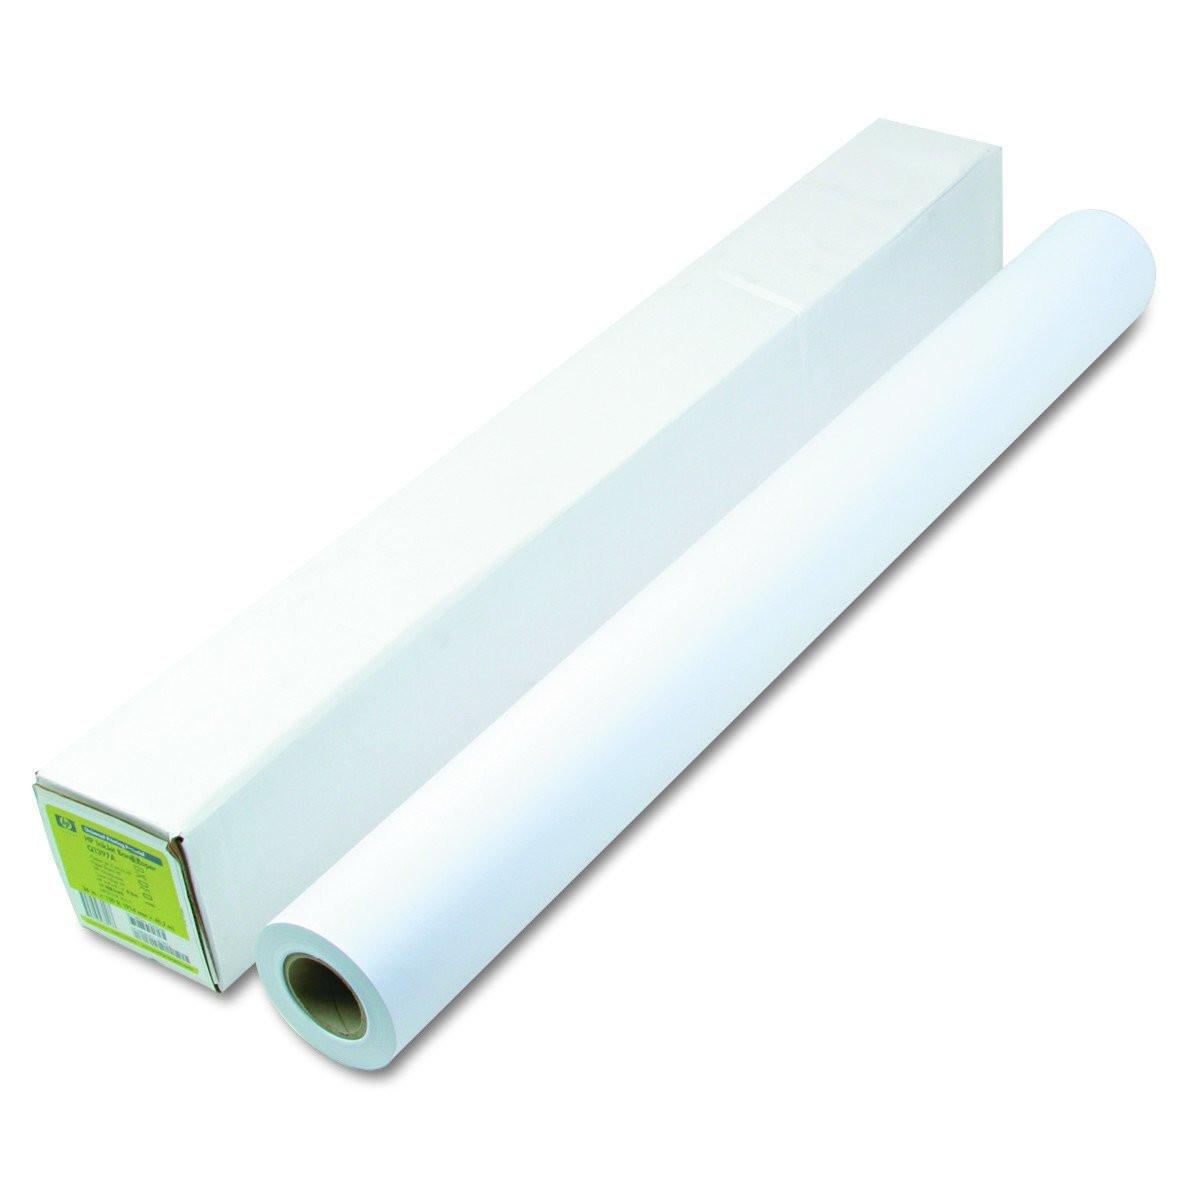 Plotter papir HP 36'' Universal bond papir 80 gram 914 mm - 45,7 meter